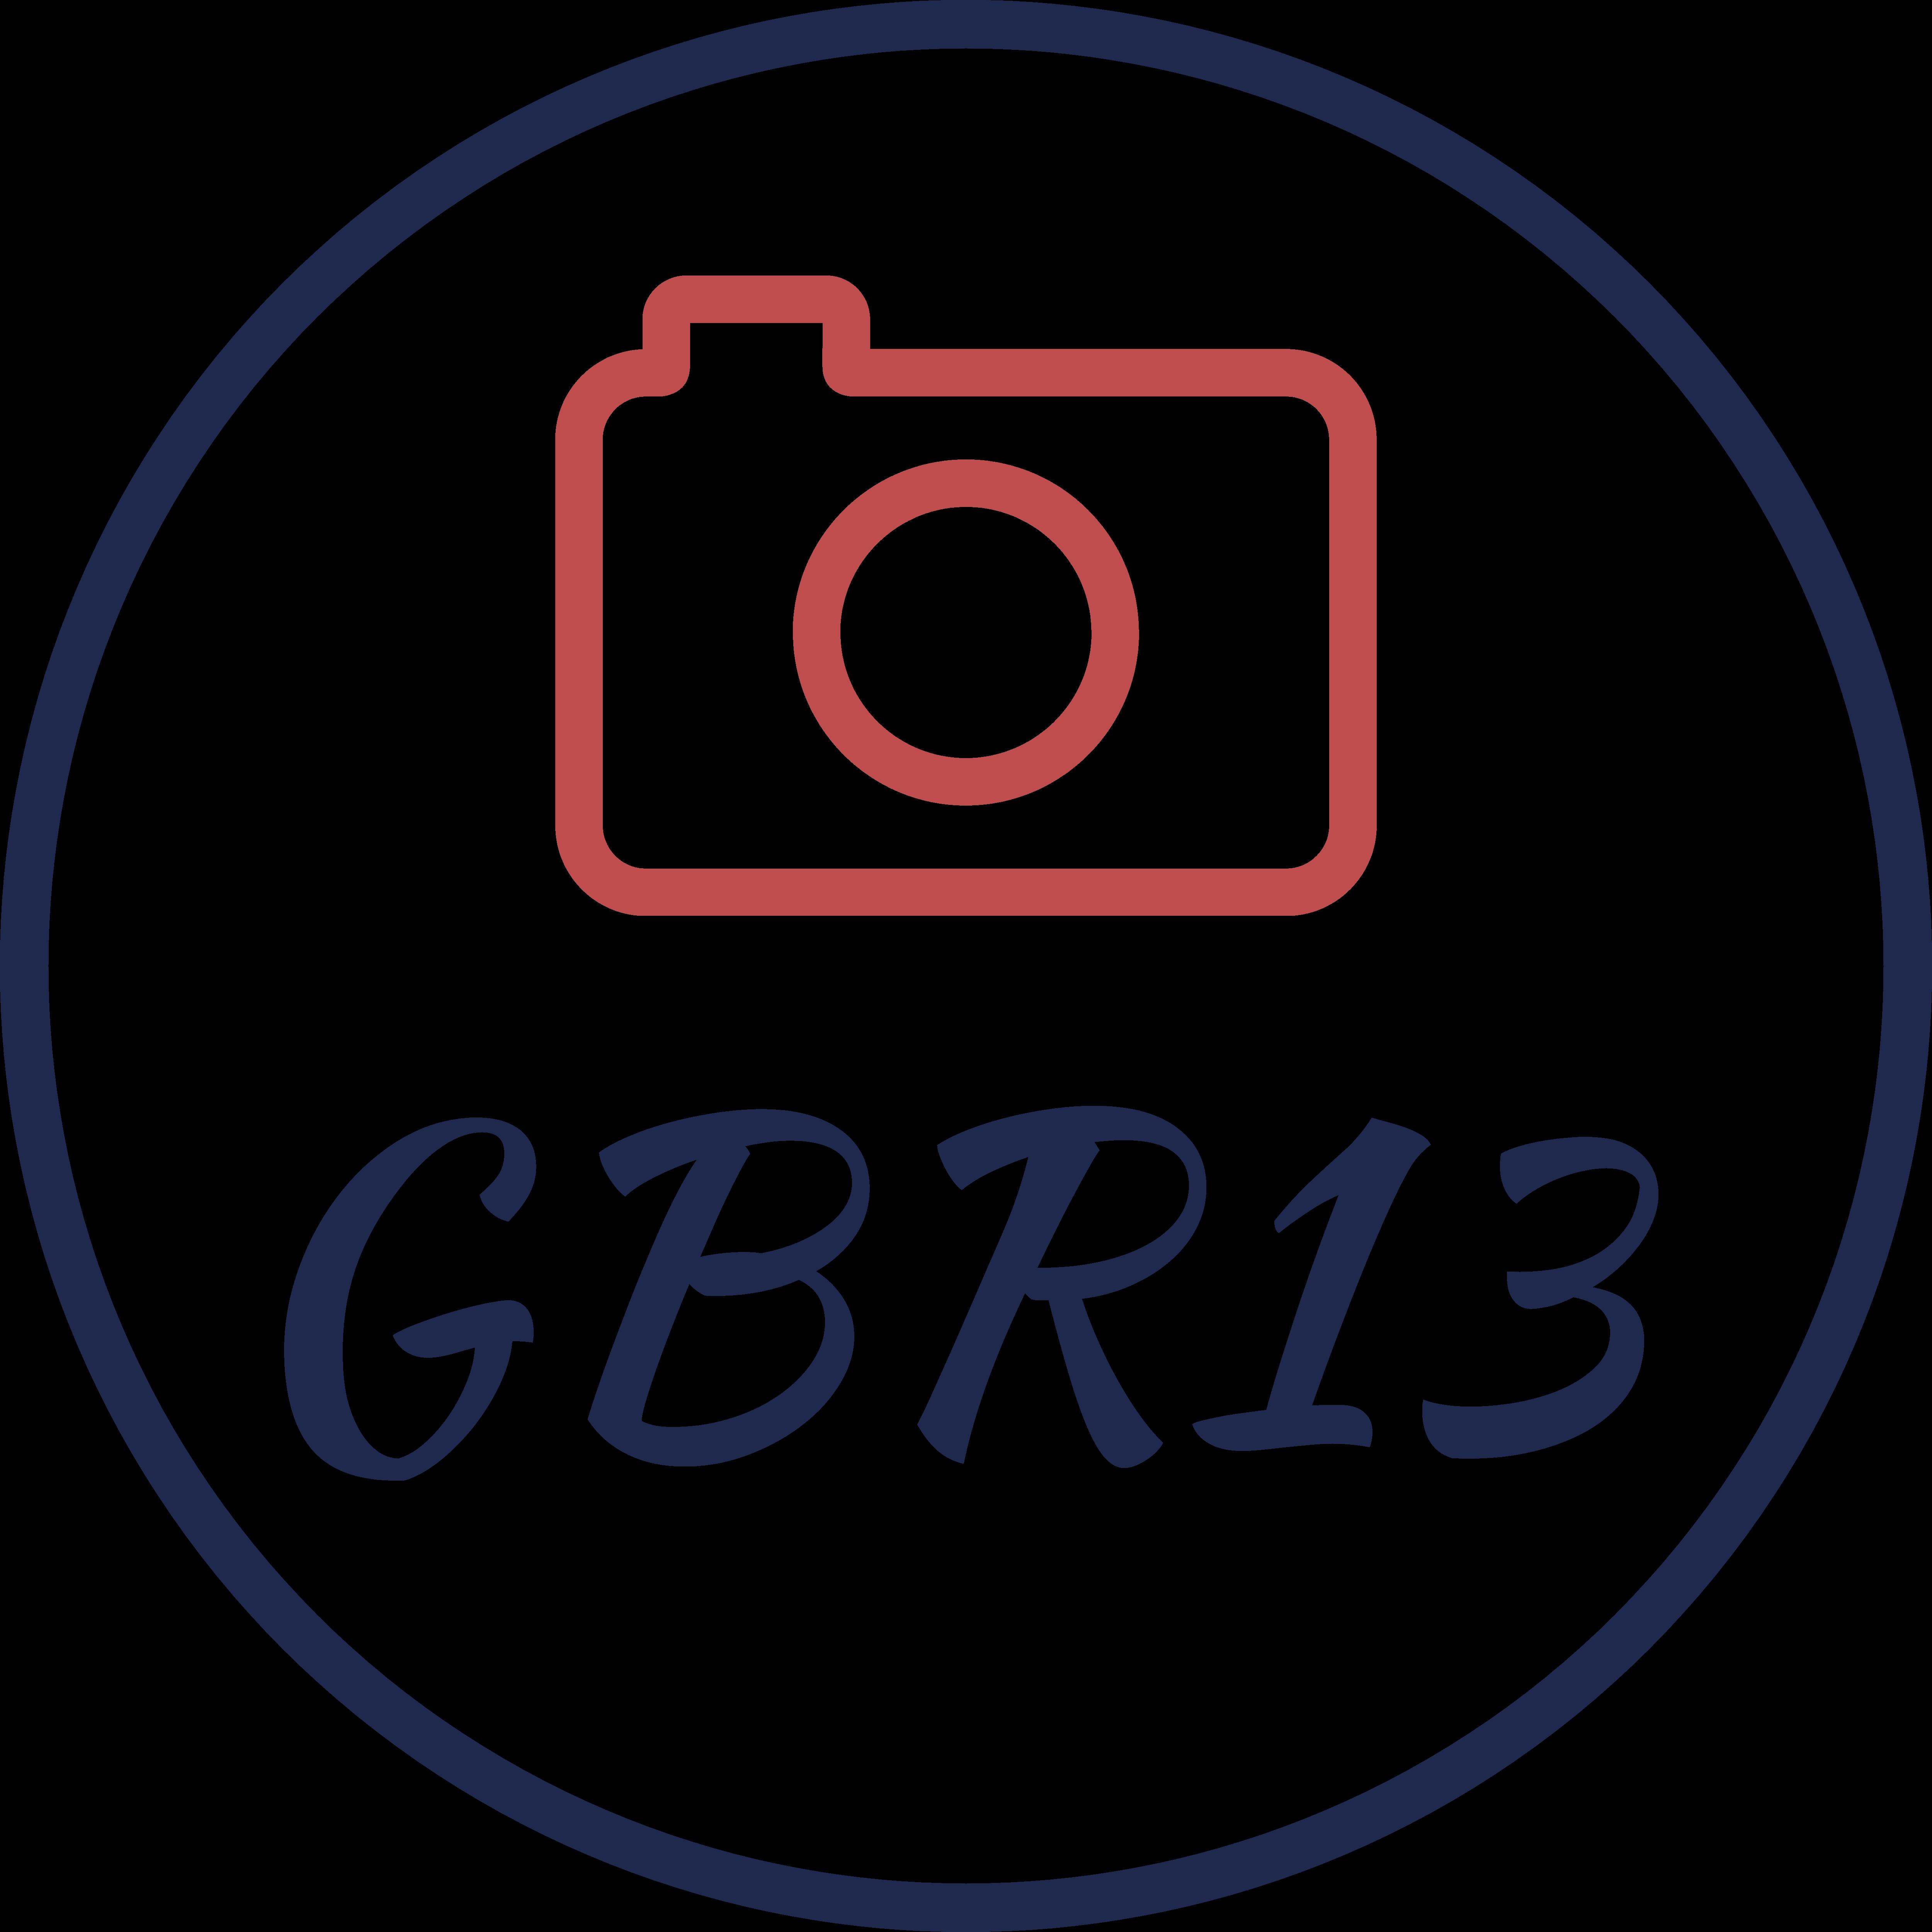 GBR13